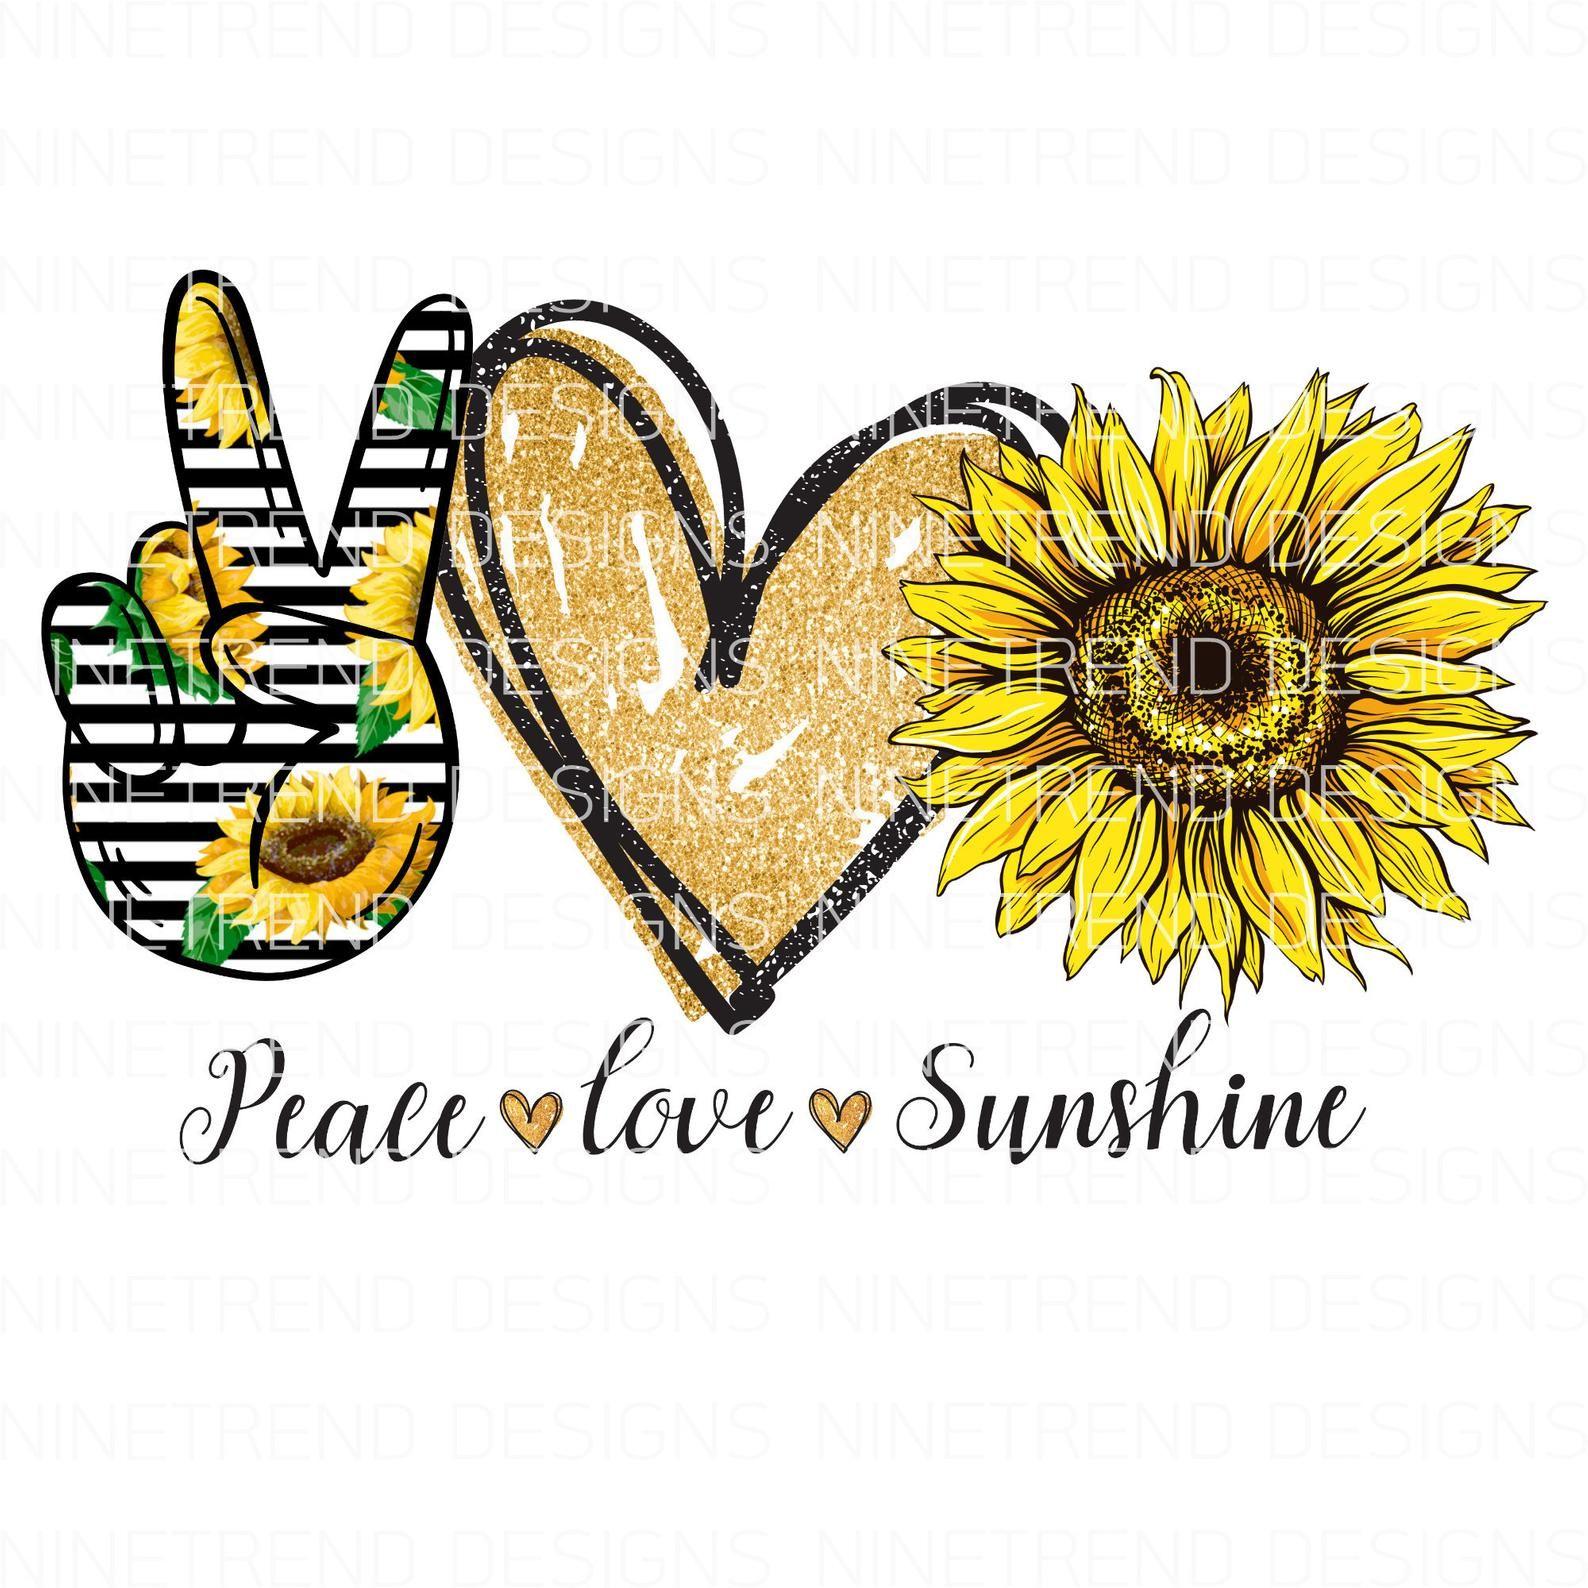 Peace Love Sunshine Png File Sublimation Designs Digital Download Sunflower Png Sunflower Sublimation Peace And Love Sunflower Png Sunflower Quotes